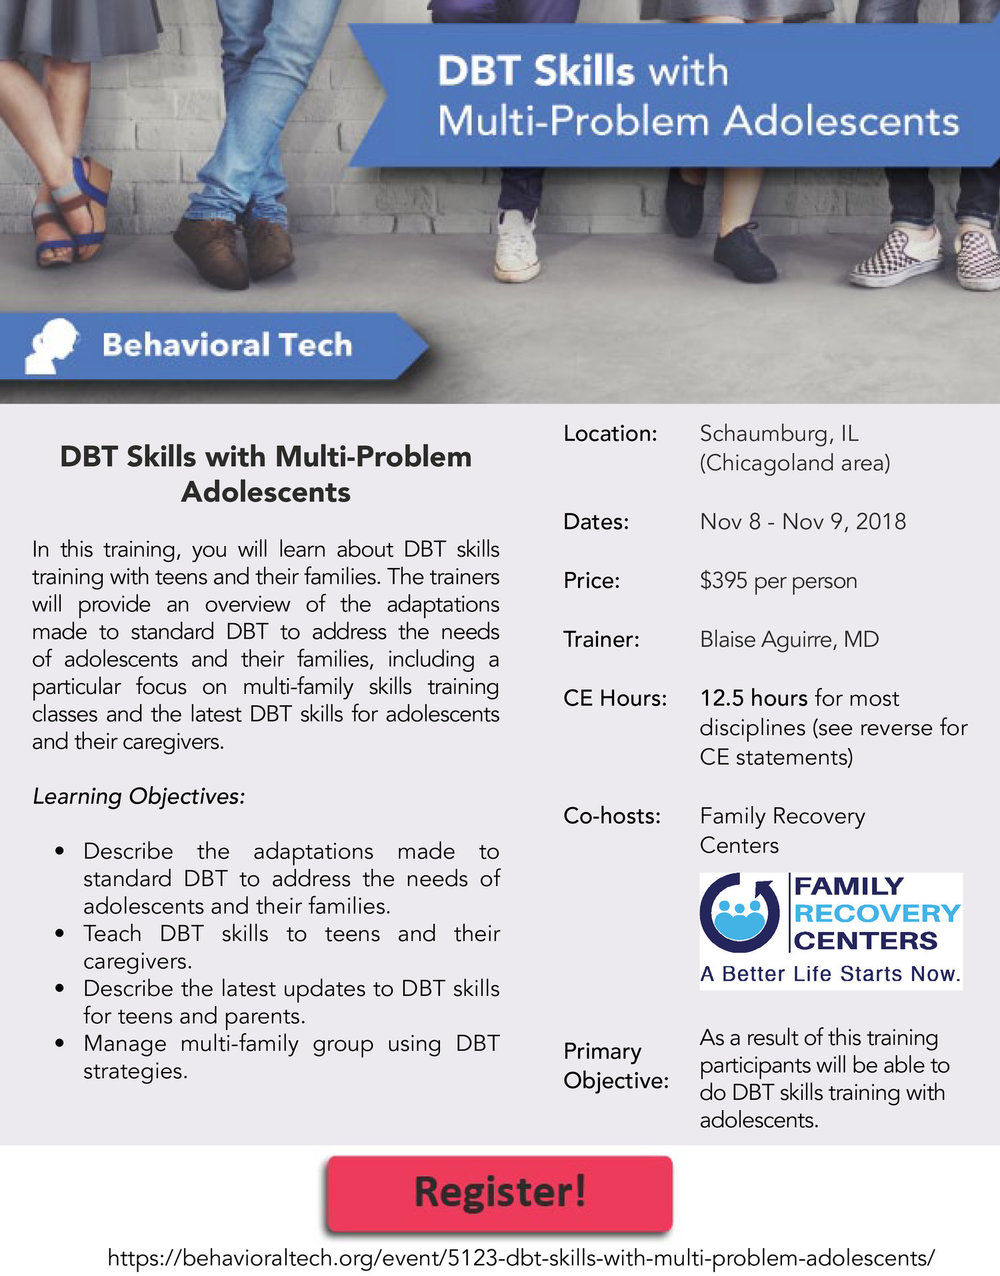 Flyer+DBT+Skills+for+Adolescents+Chicago,+IL_IMG.jpg